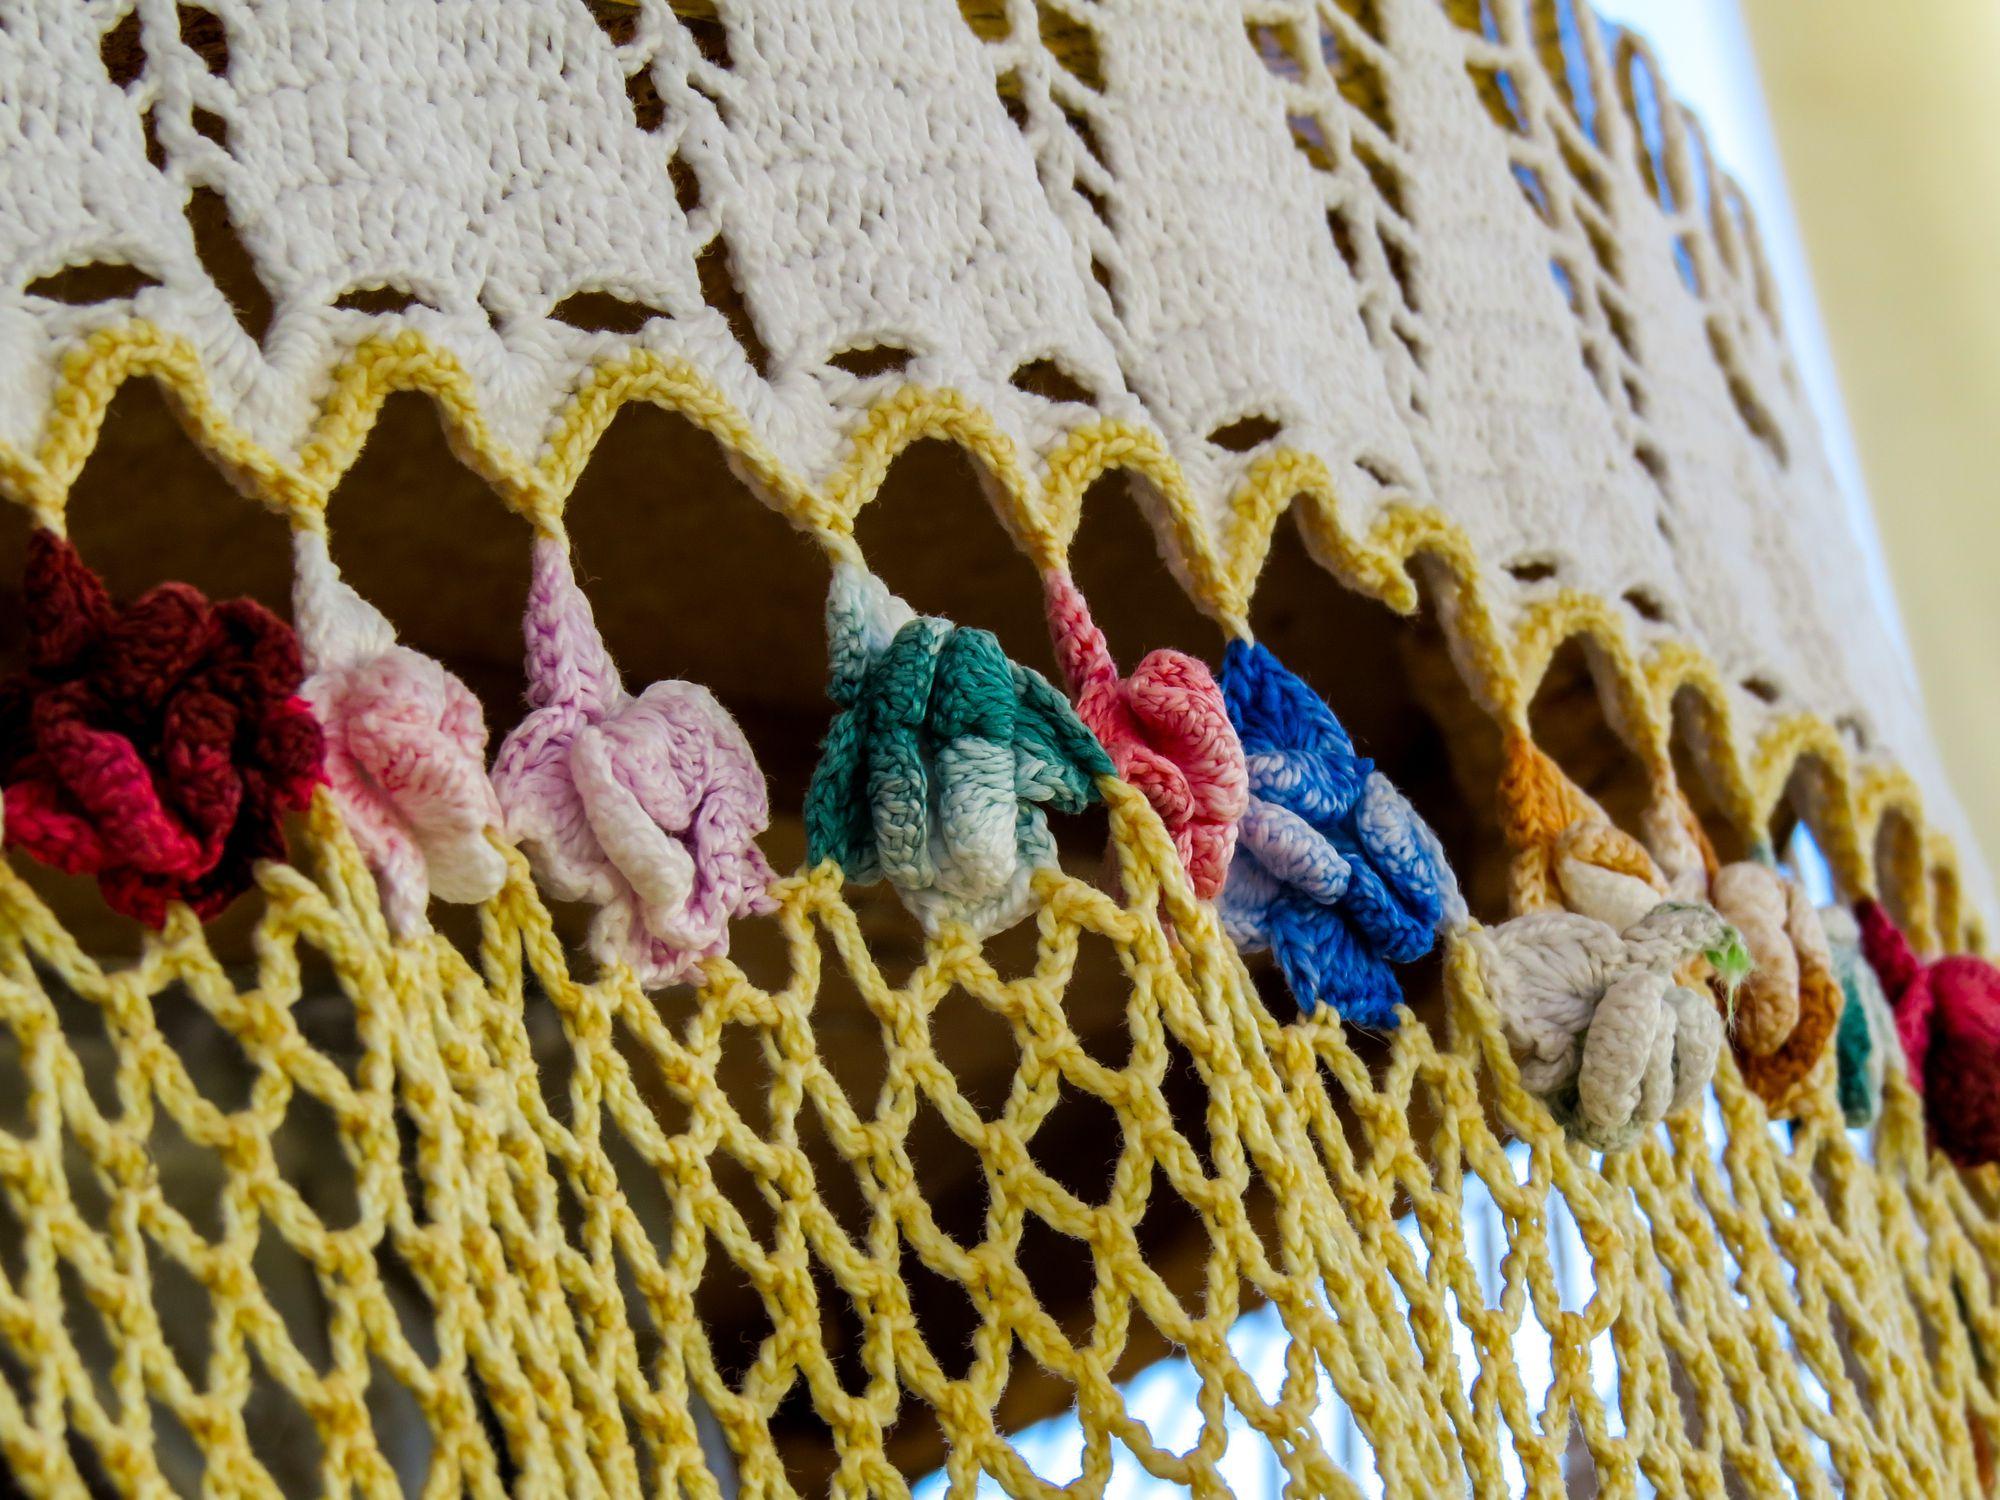 Easy free crochet lapghan pattern quick project solid shell stitch towel topper free crochet pattern bankloansurffo Gallery